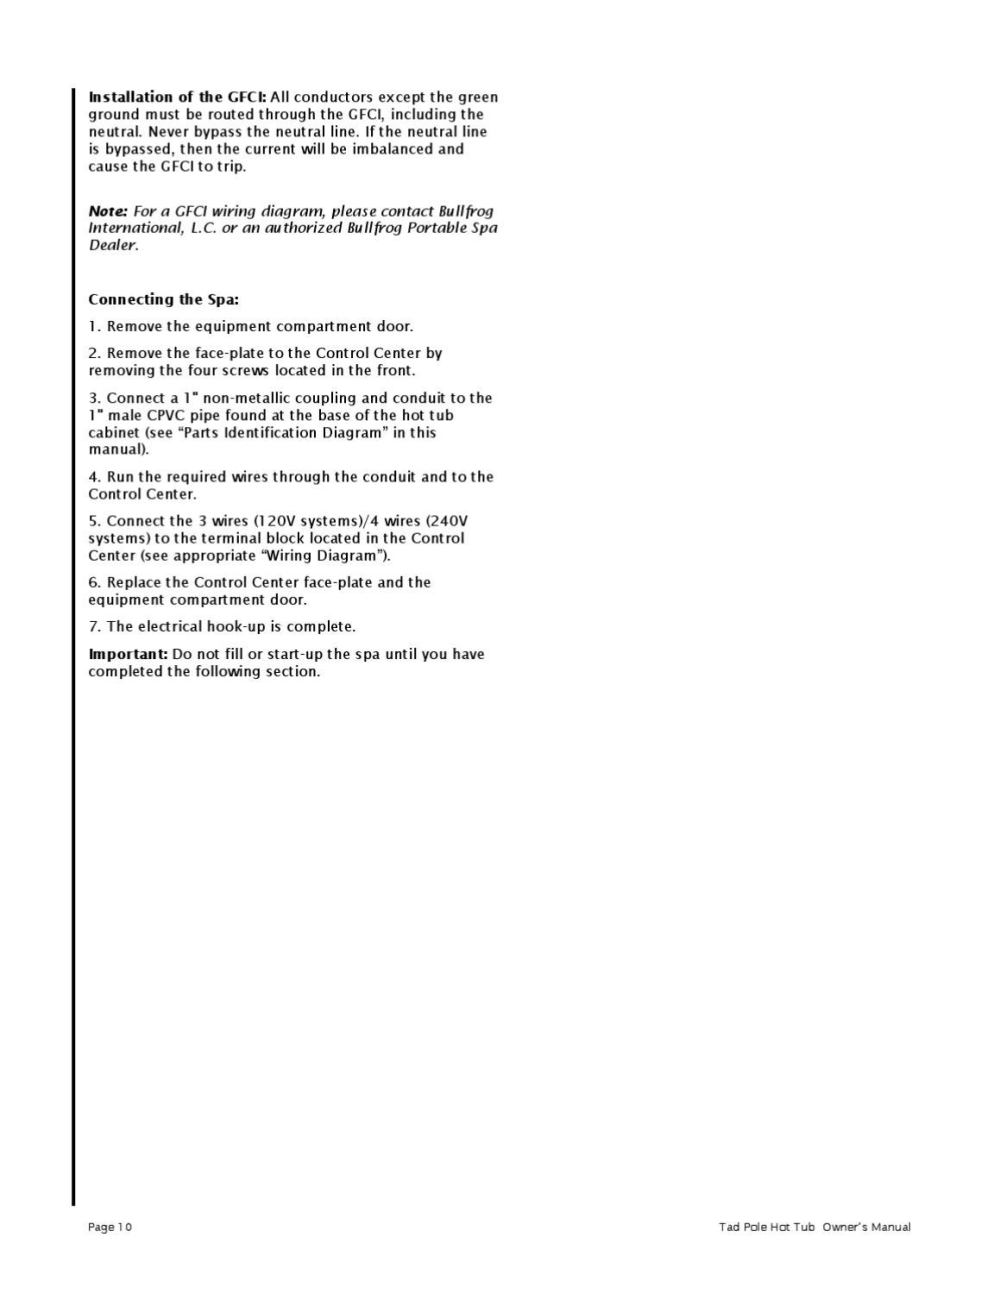 medium resolution of tadpole hot tub owners manual 2003 by envirosmarte hot tubs swim spas issuu